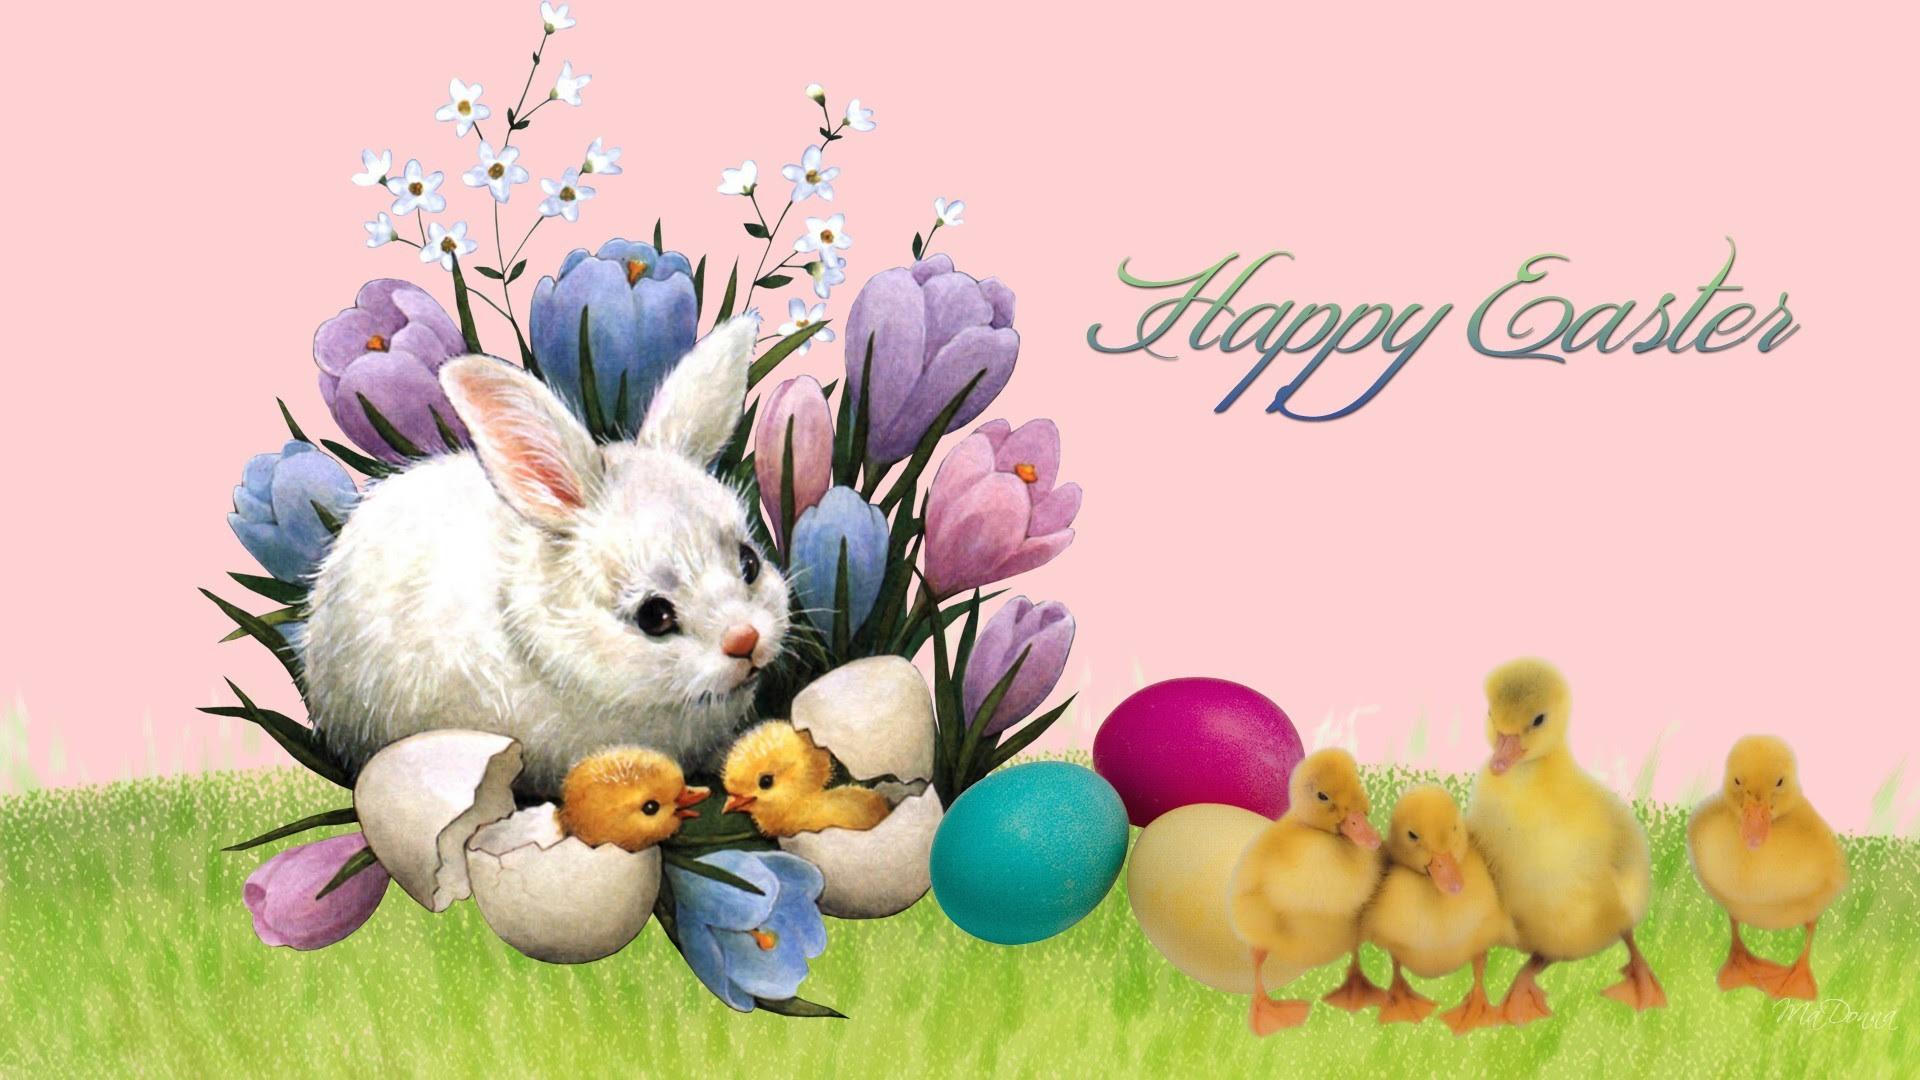 Easter Wallpapers Desktop 71 Images